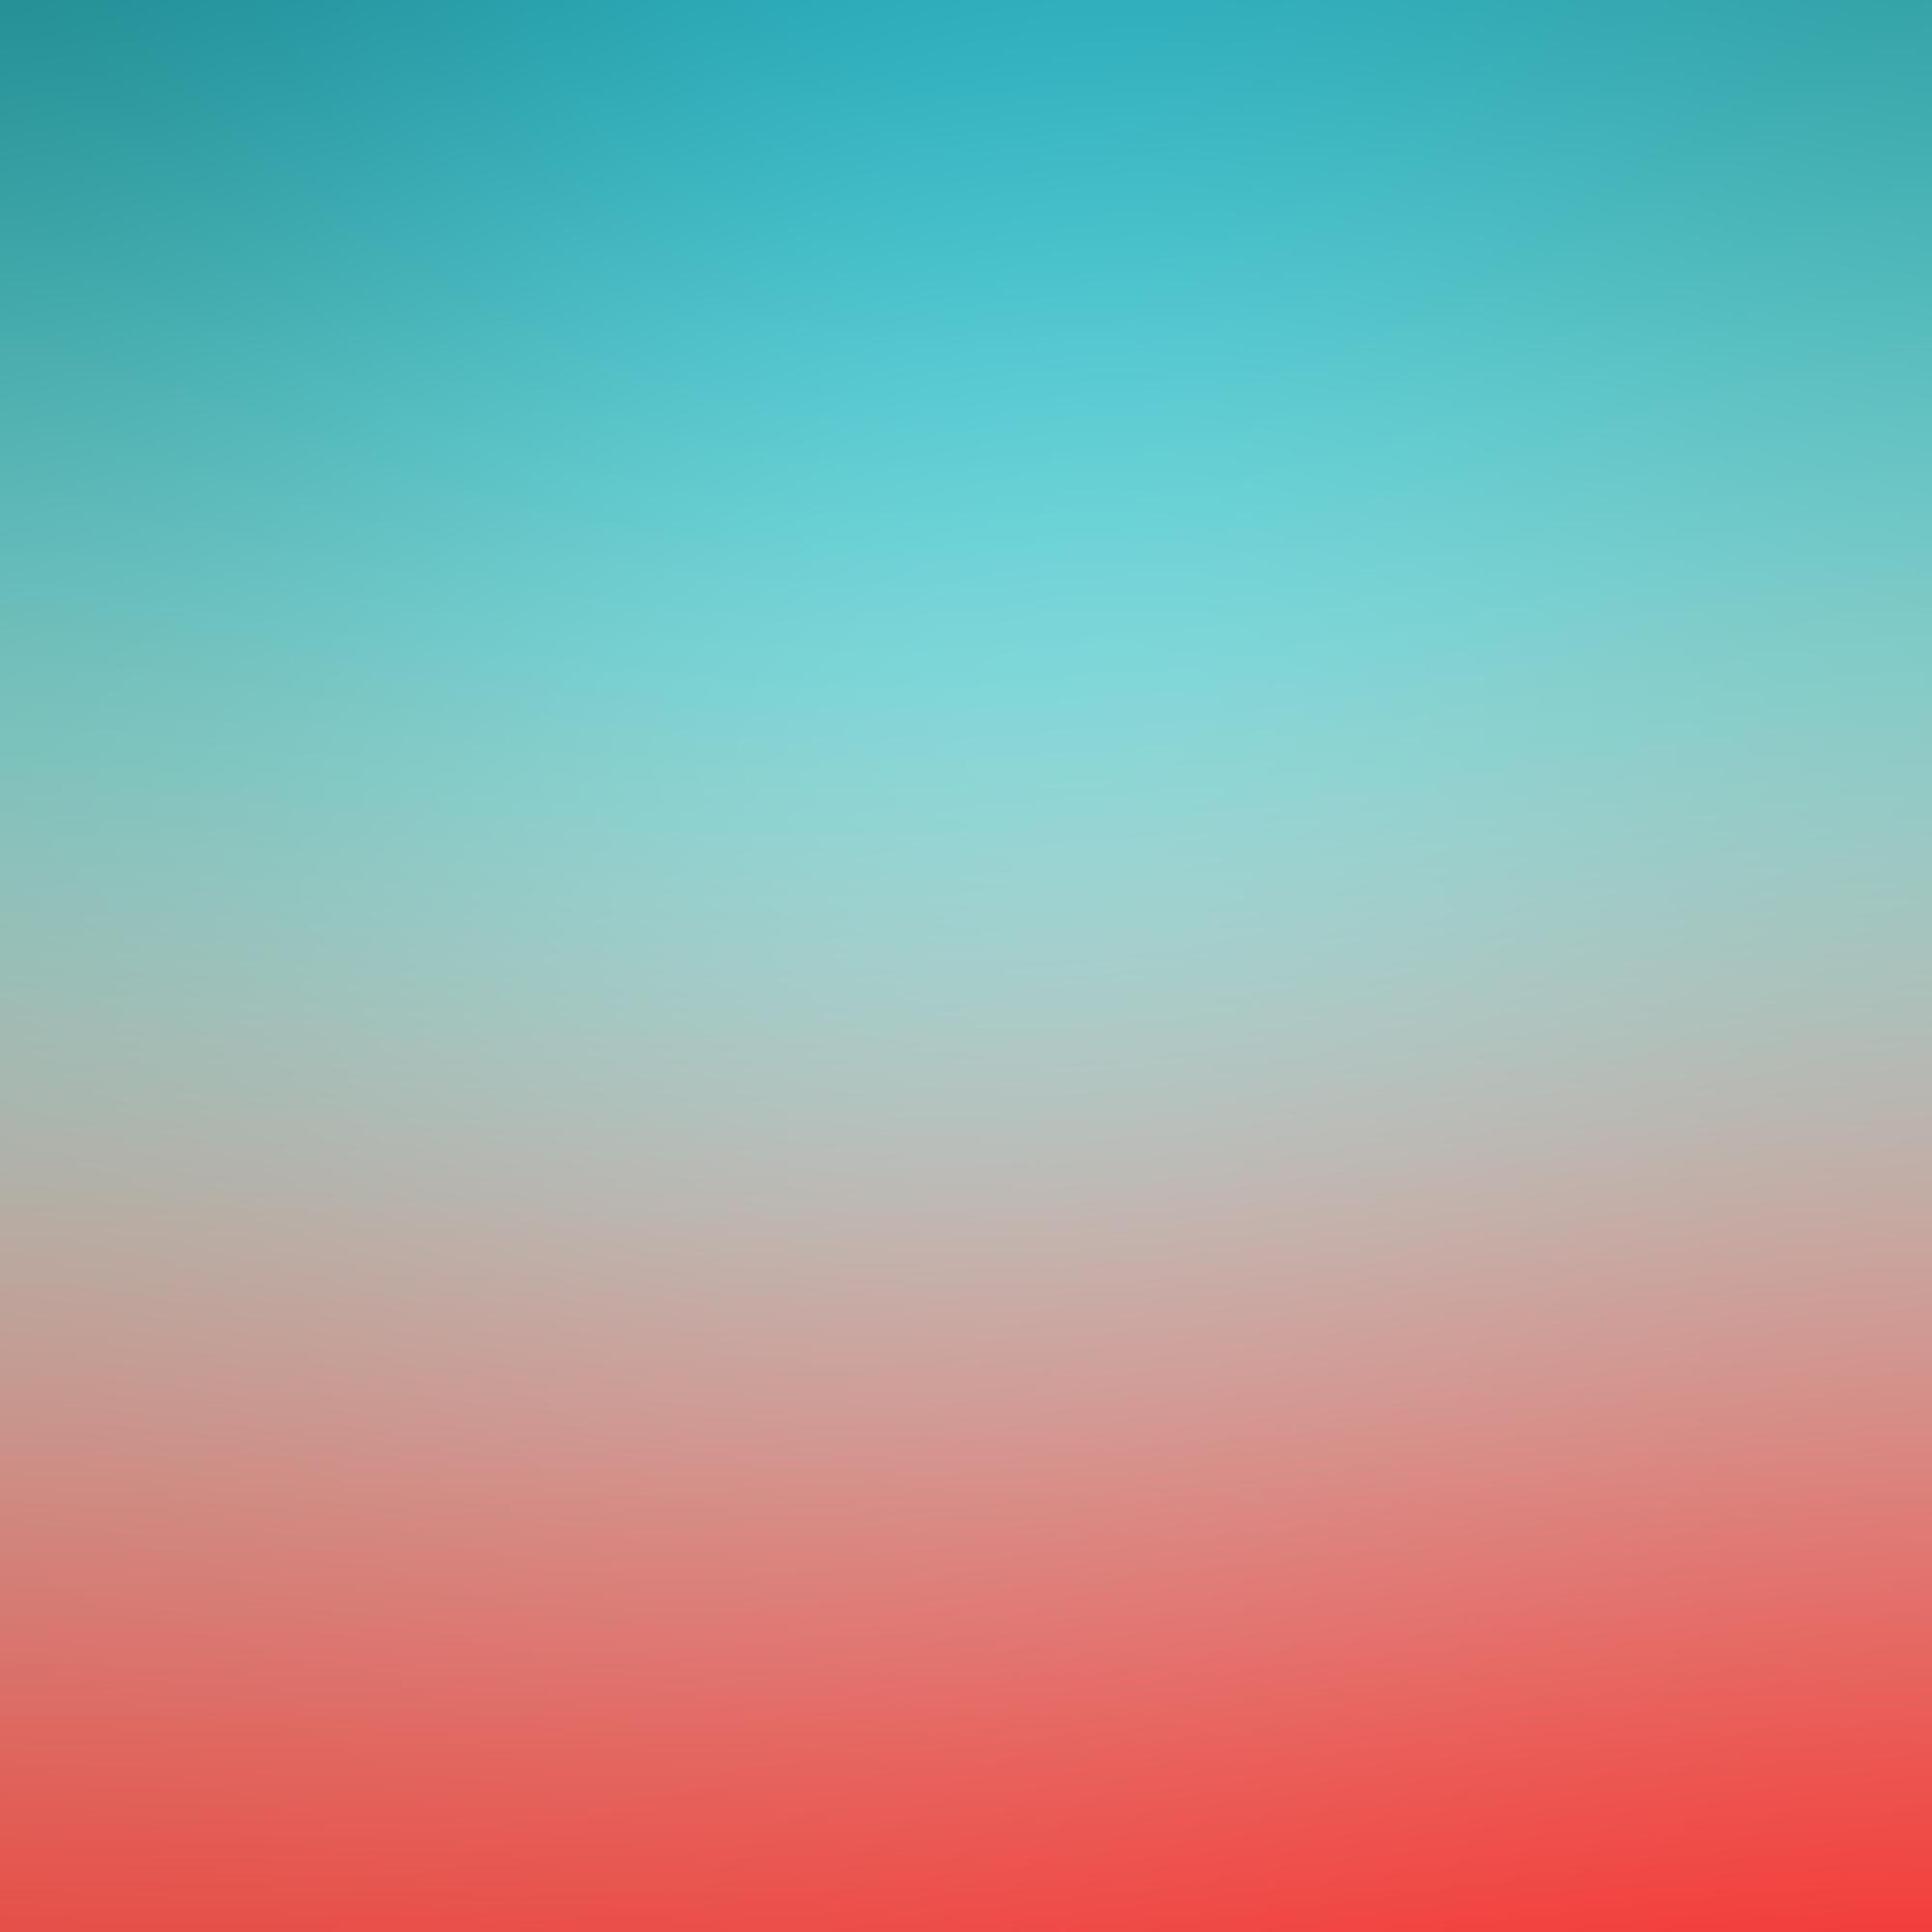 gradients_8.png